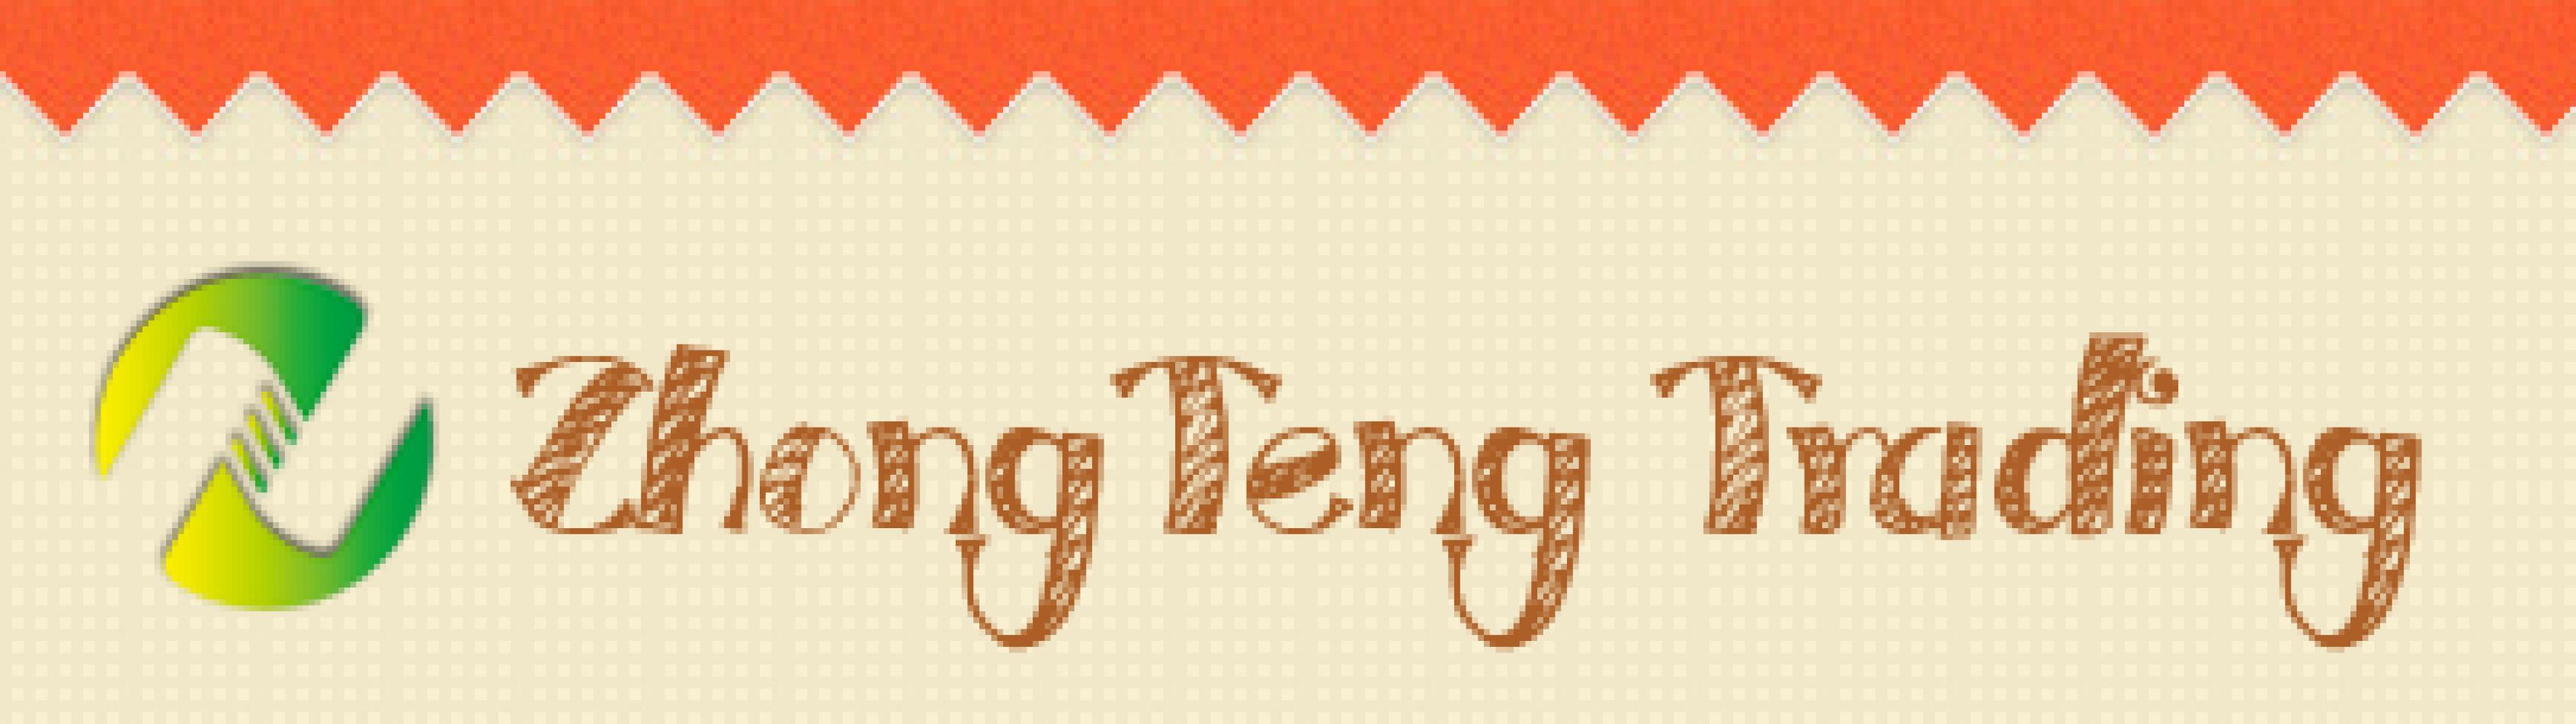 HENAN ZHONGTENG TRADING COMPANY LTD